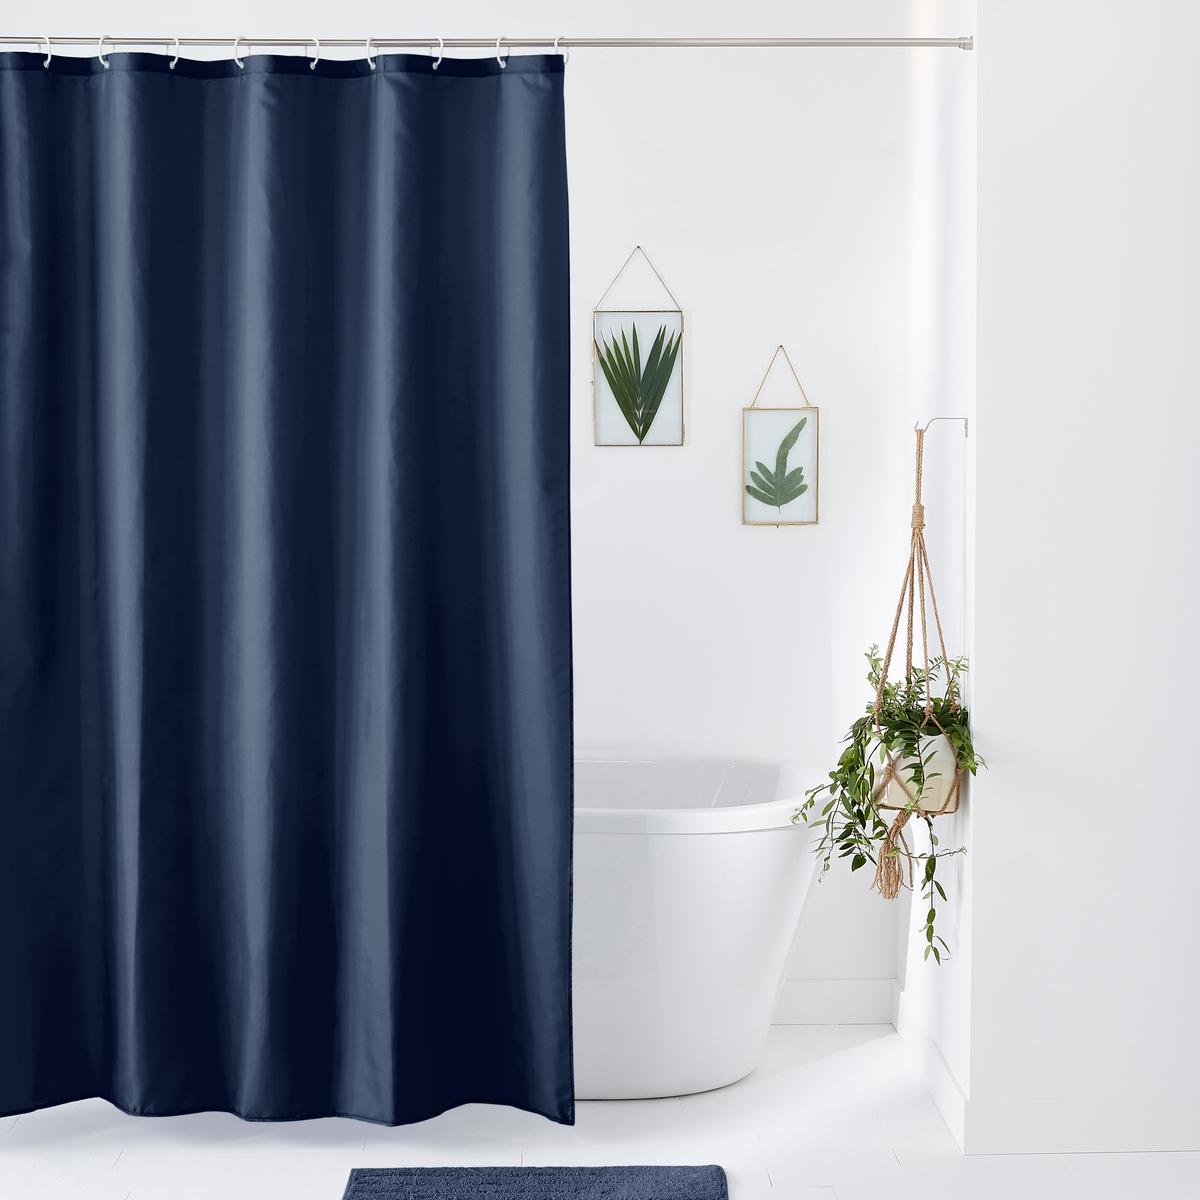 Штора La Redoute Для душа Scnario 200 x 180 см синий штора для ванной dasch la vita кораллы цвет мультиколор 178 х 200 см